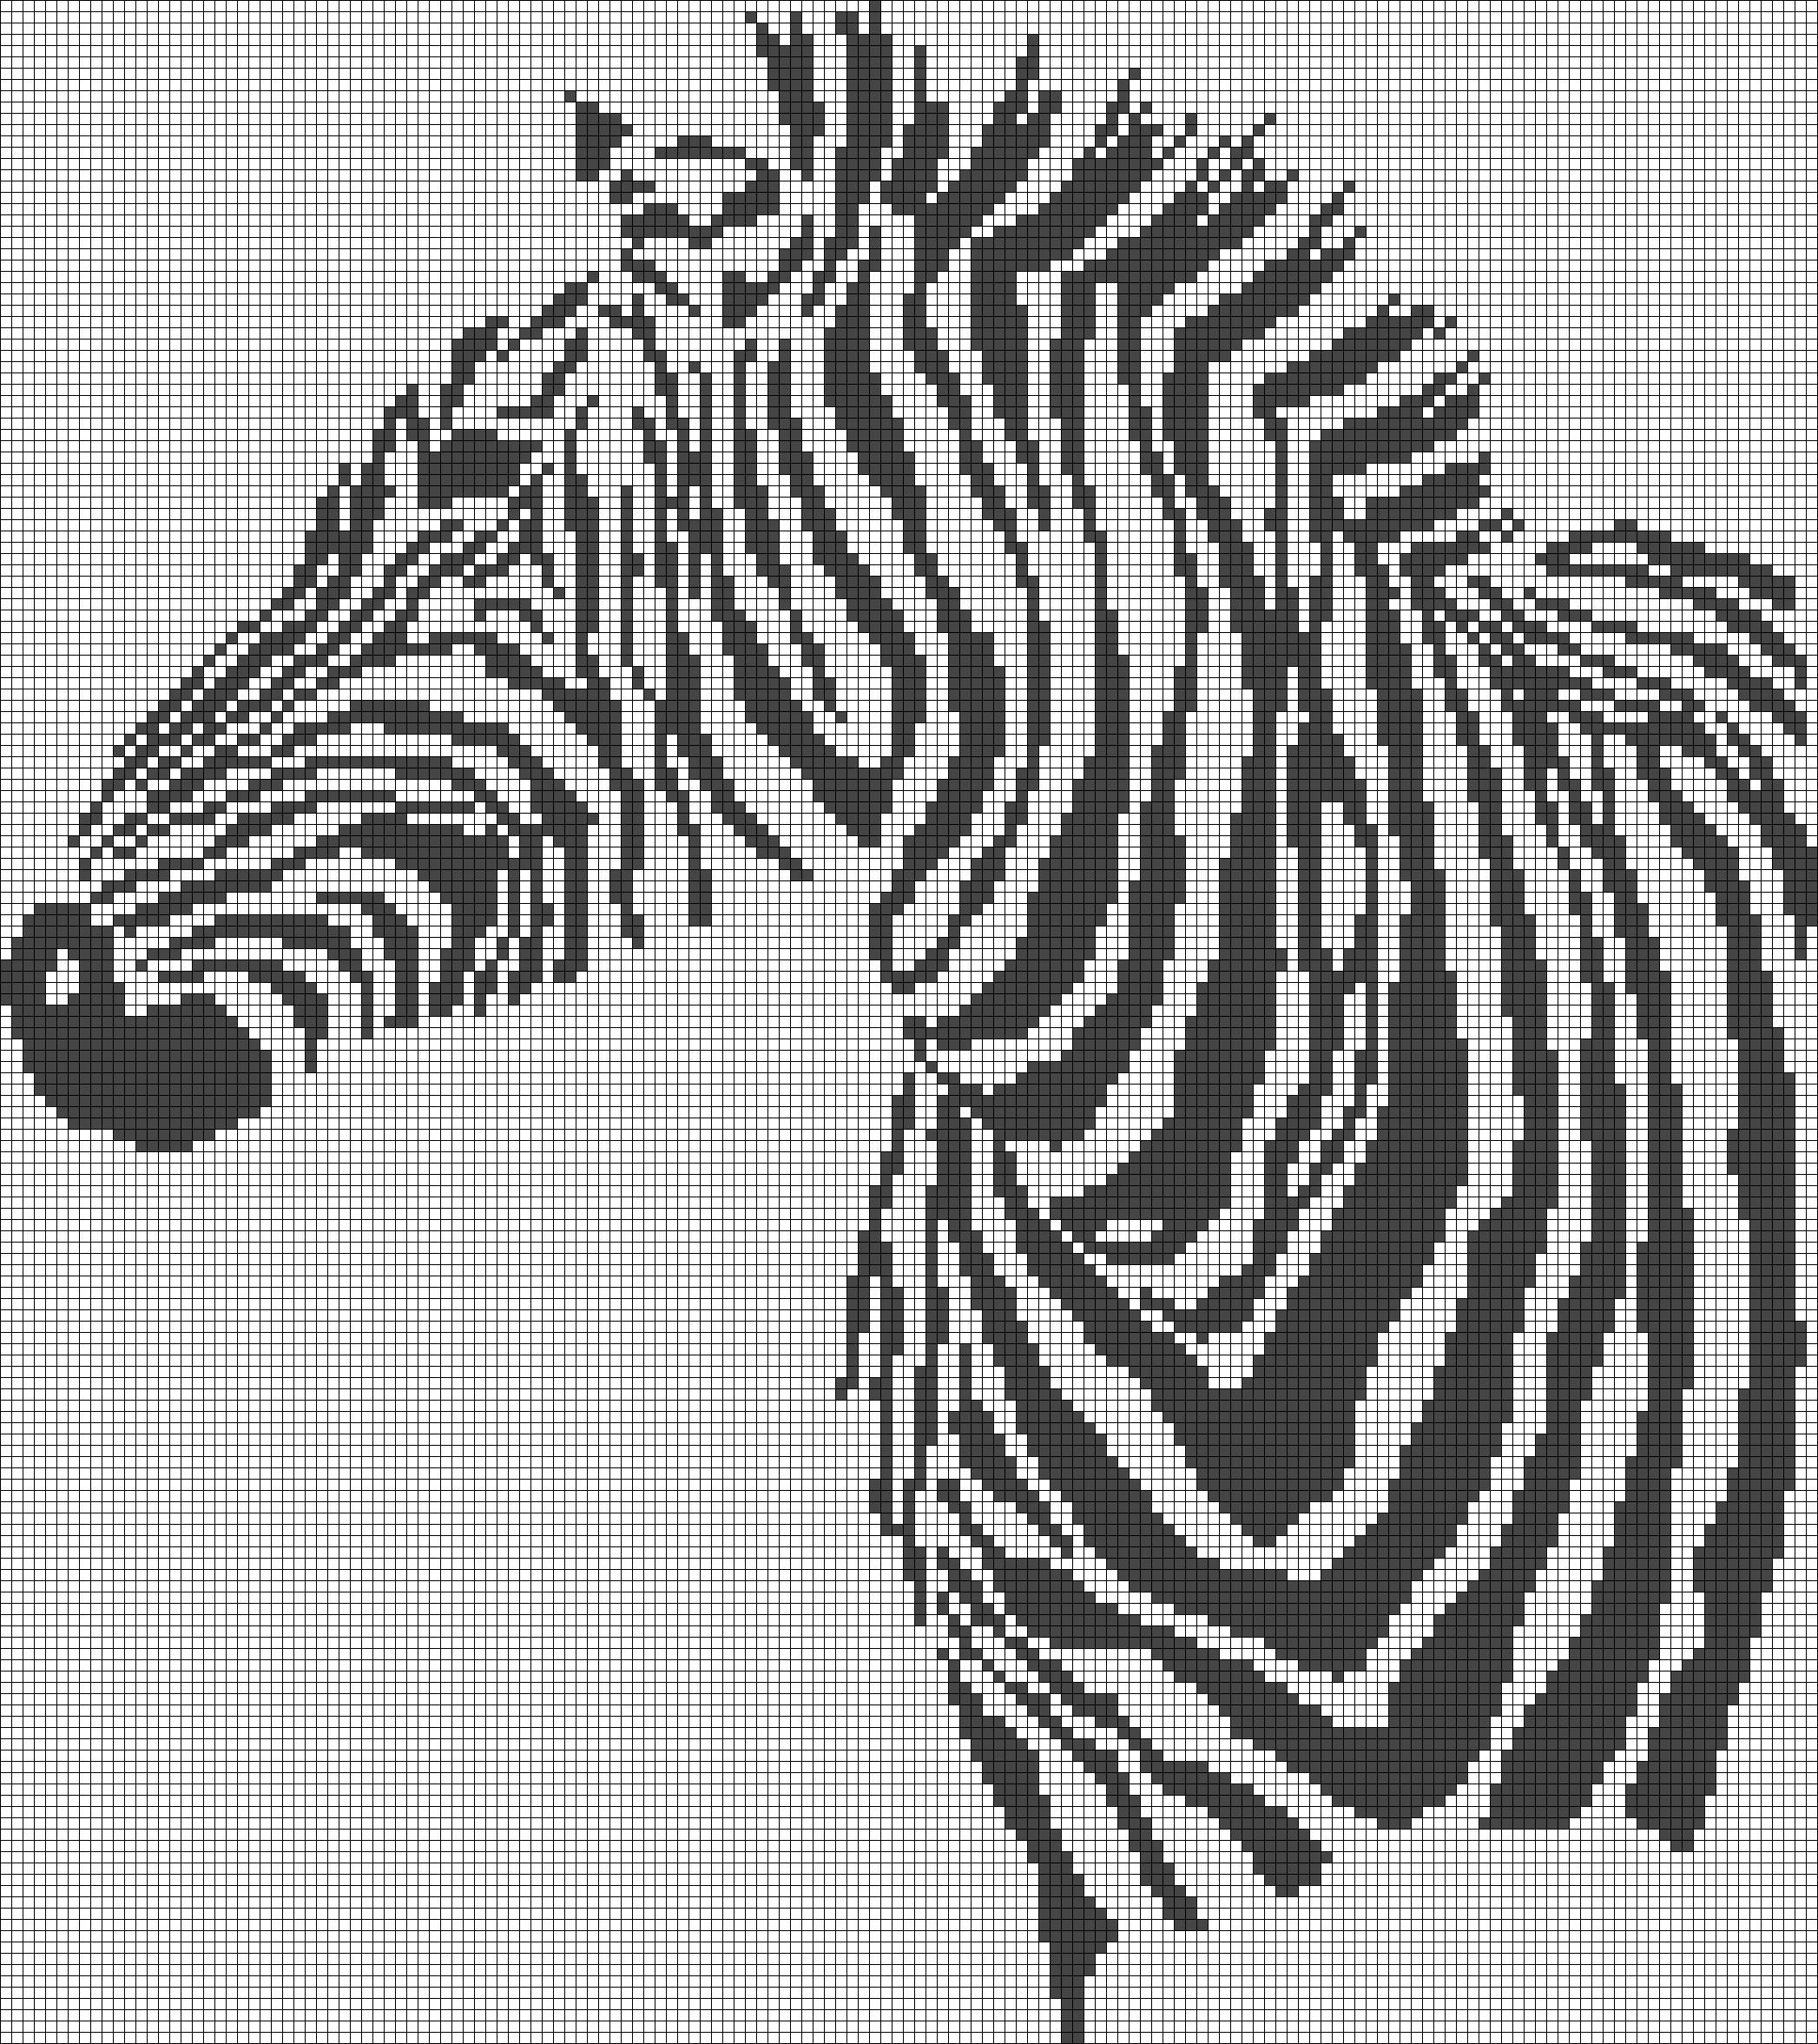 Zebra pattern / chart for cross stitch, crochet, knitting